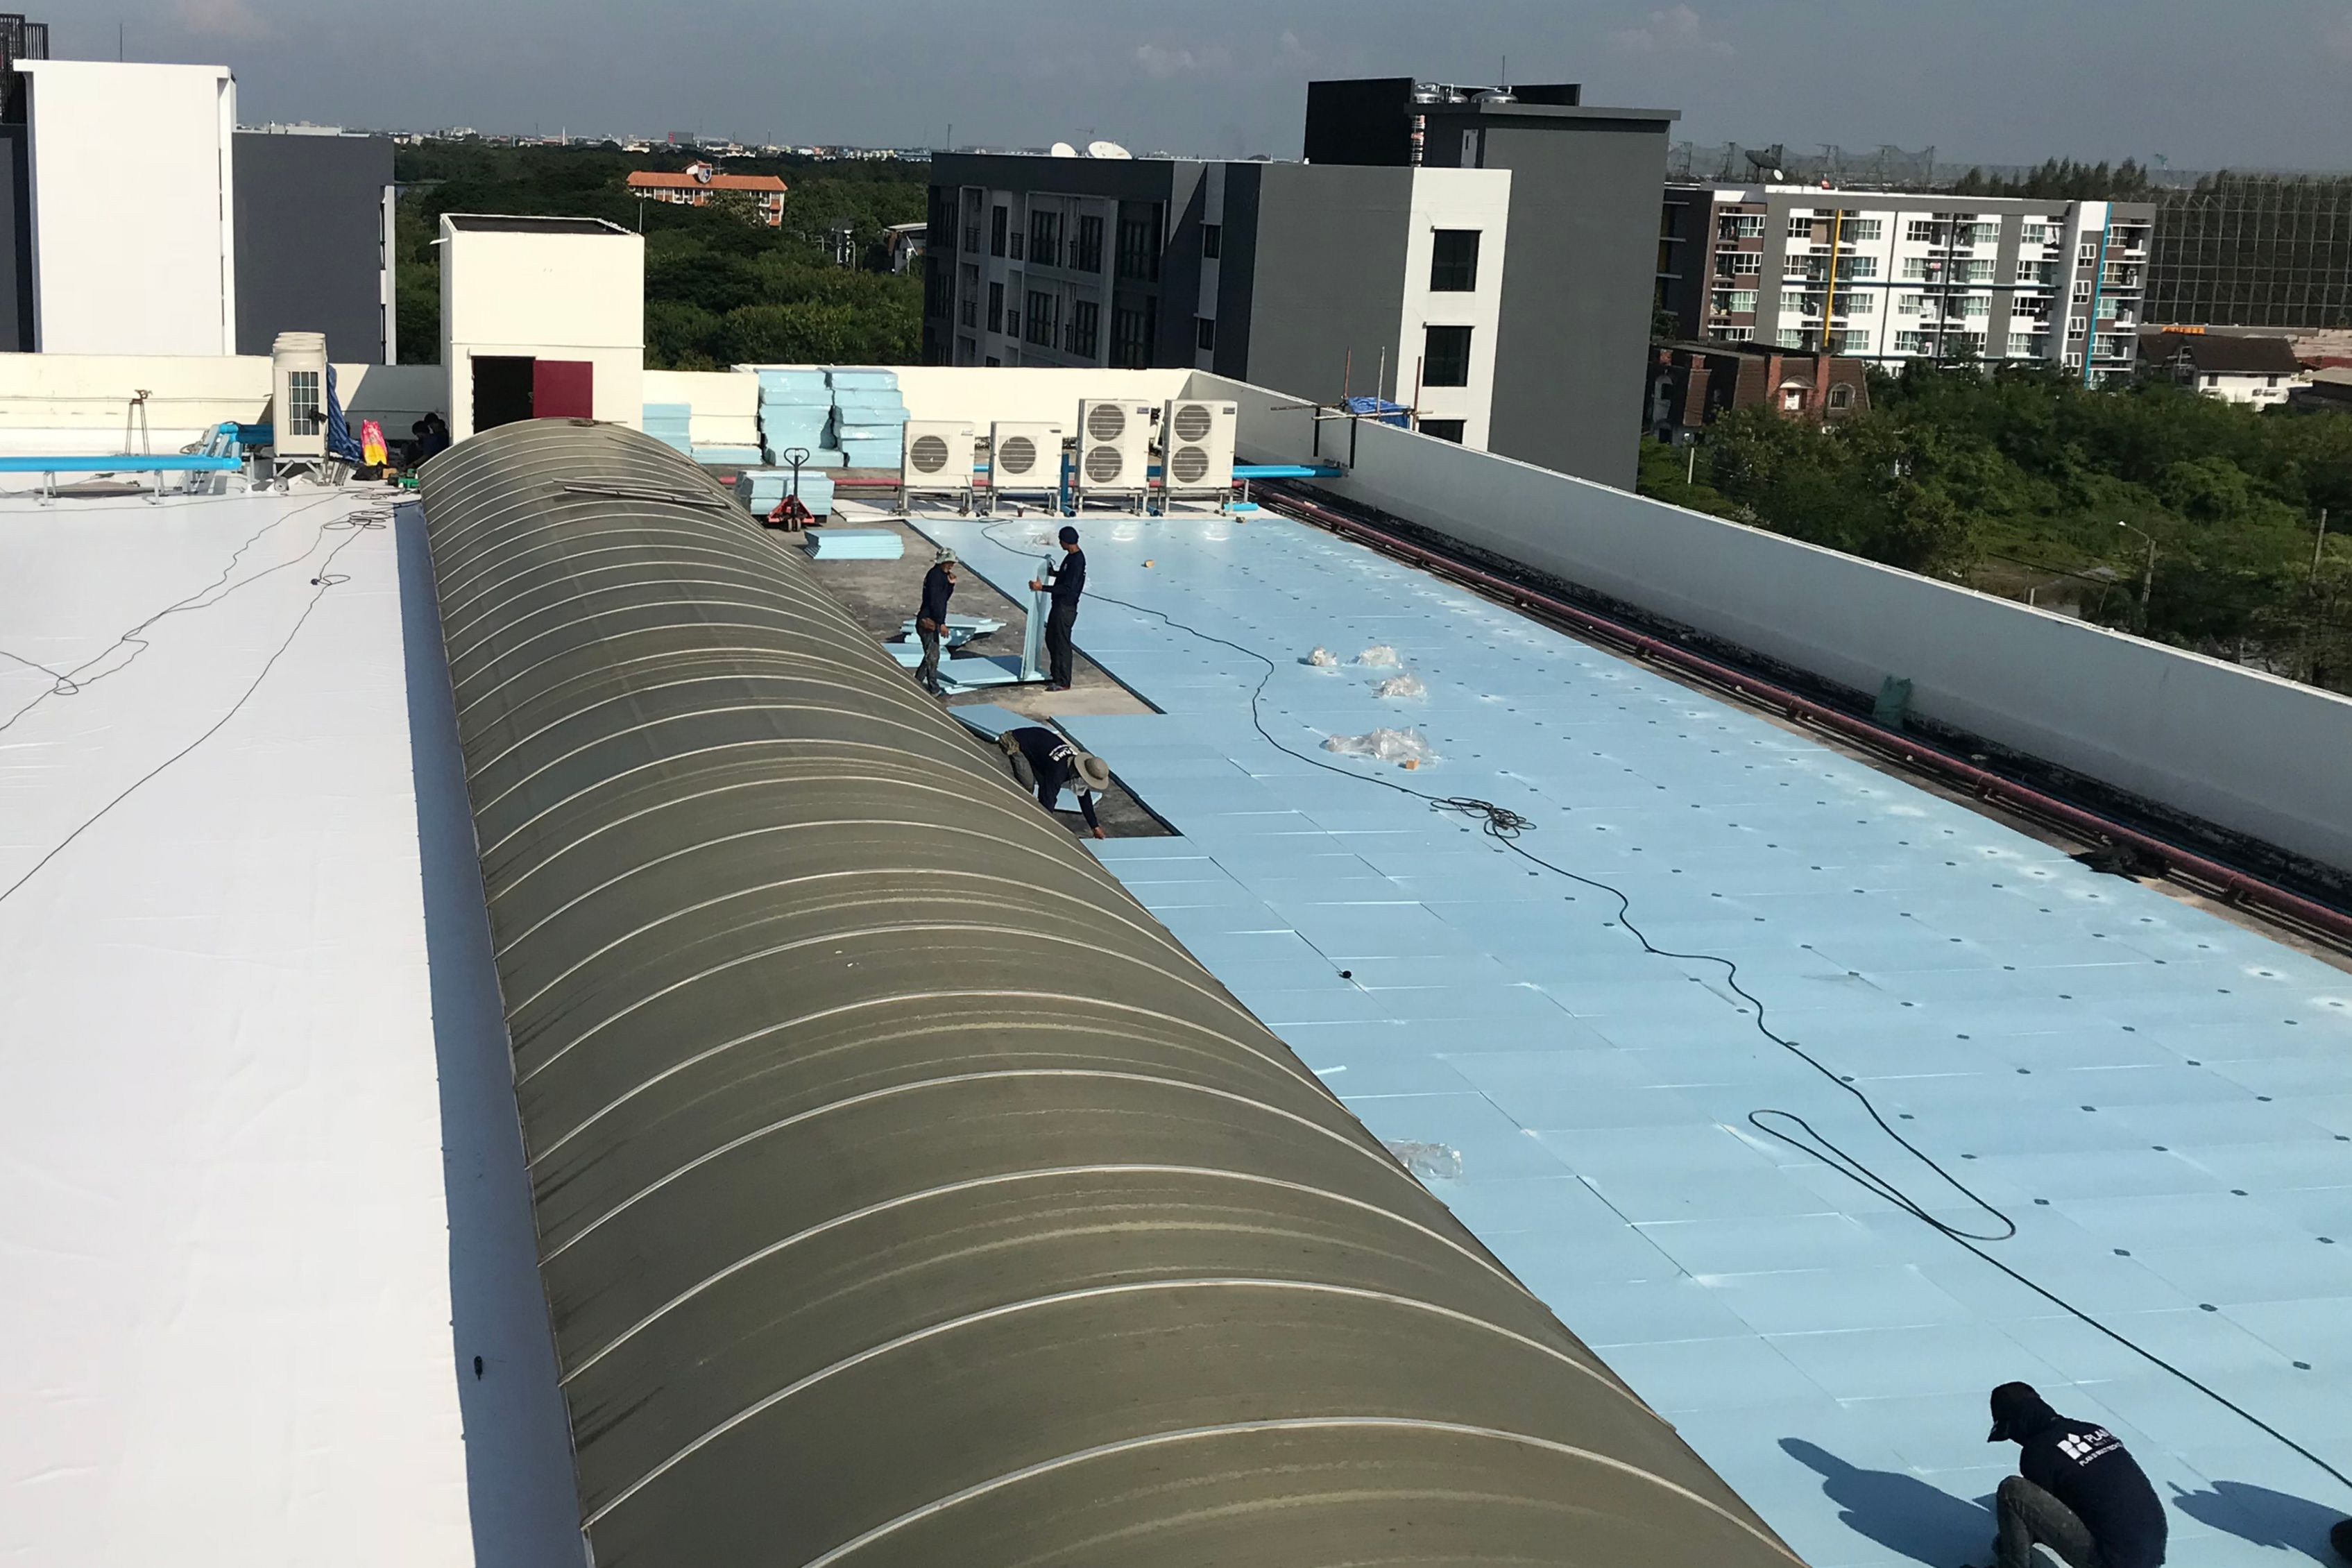 Dusit Thani College Sarnafil Roofing